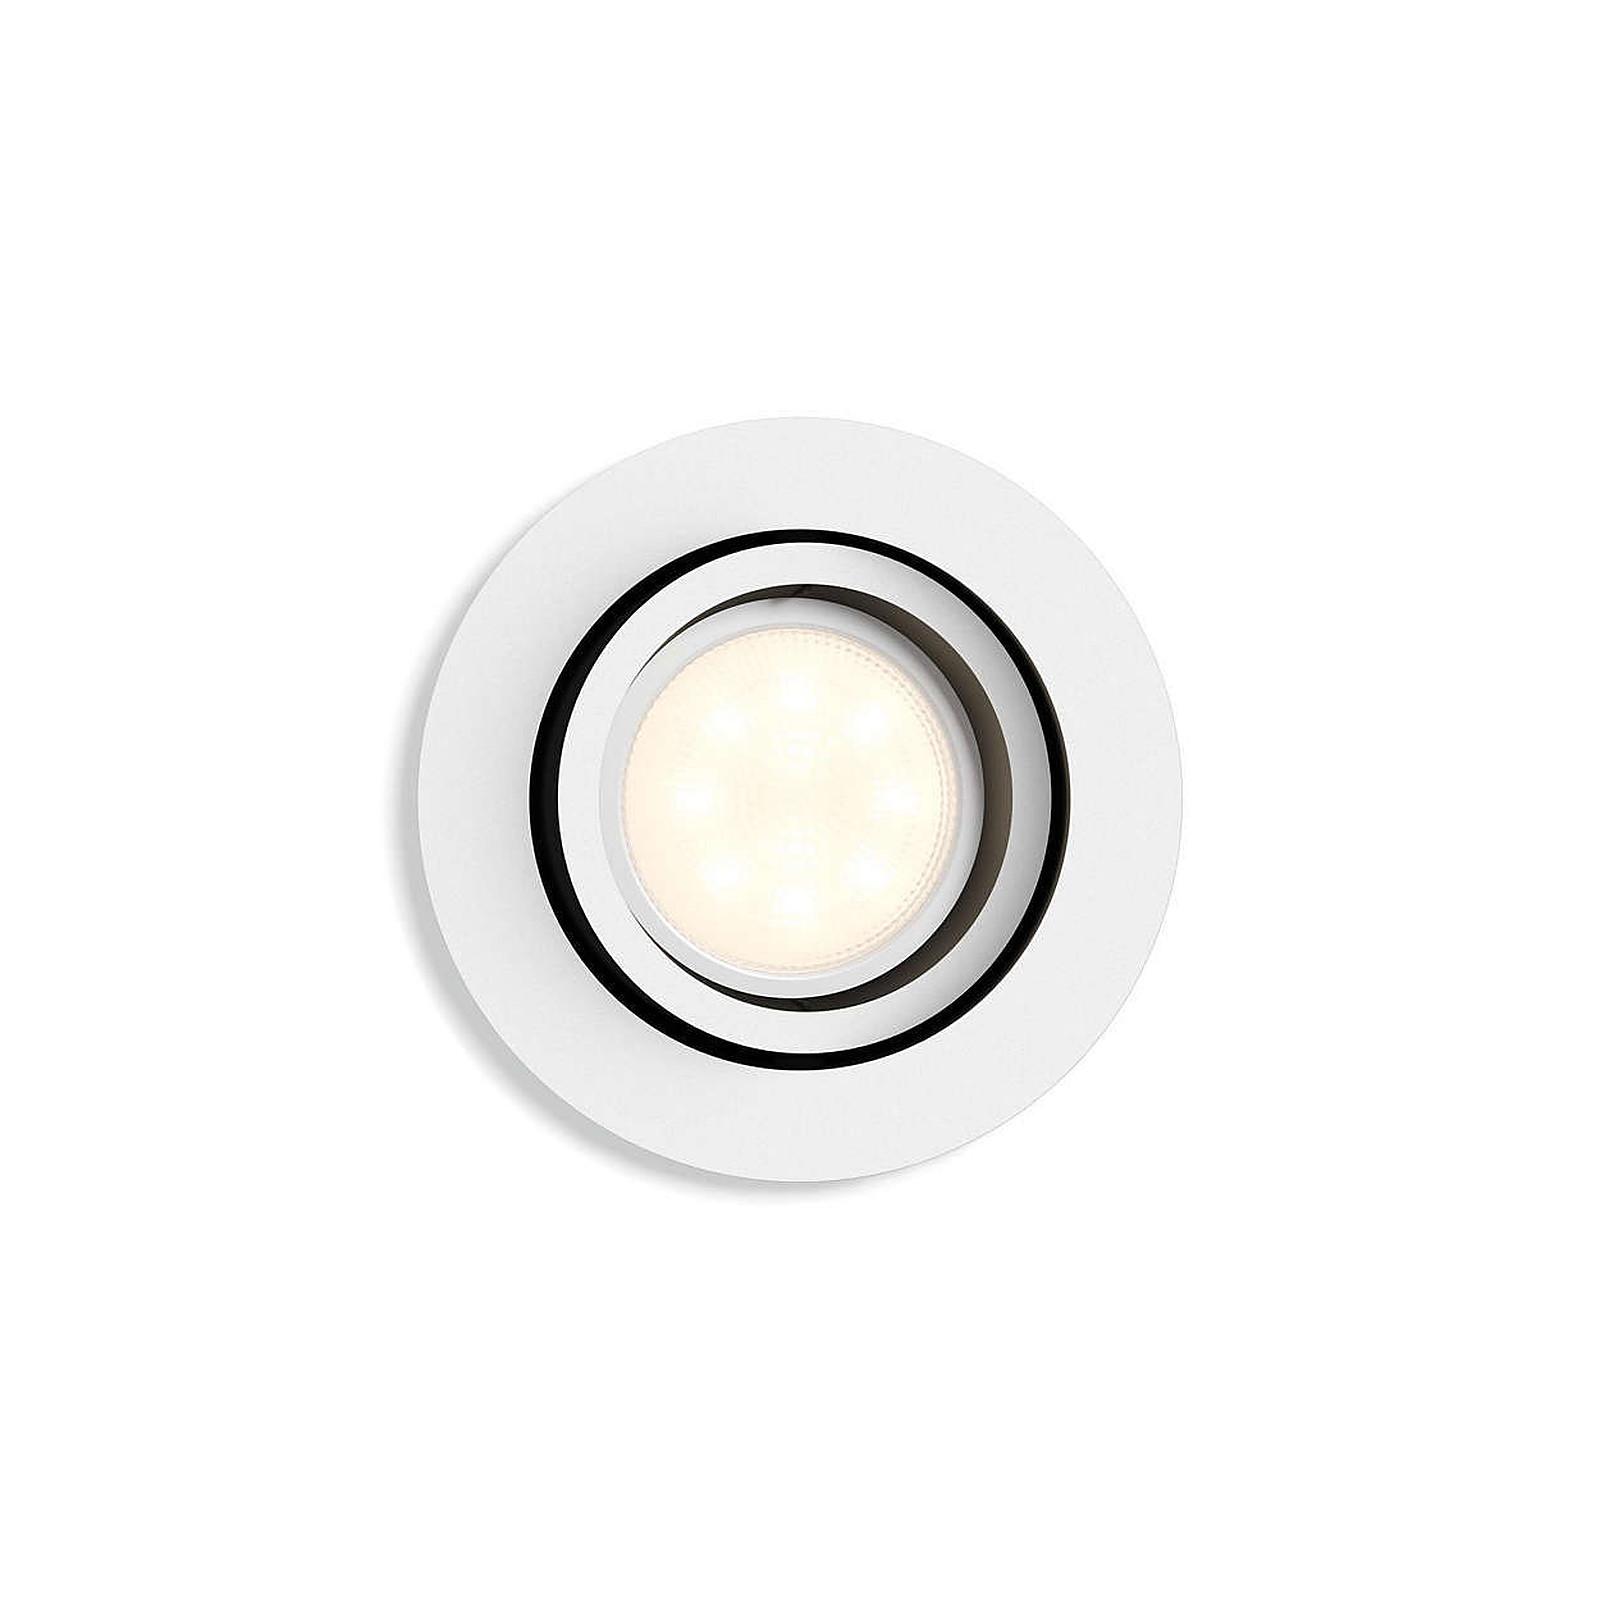 Philips White ambiance Milliskin Spot à encastrer